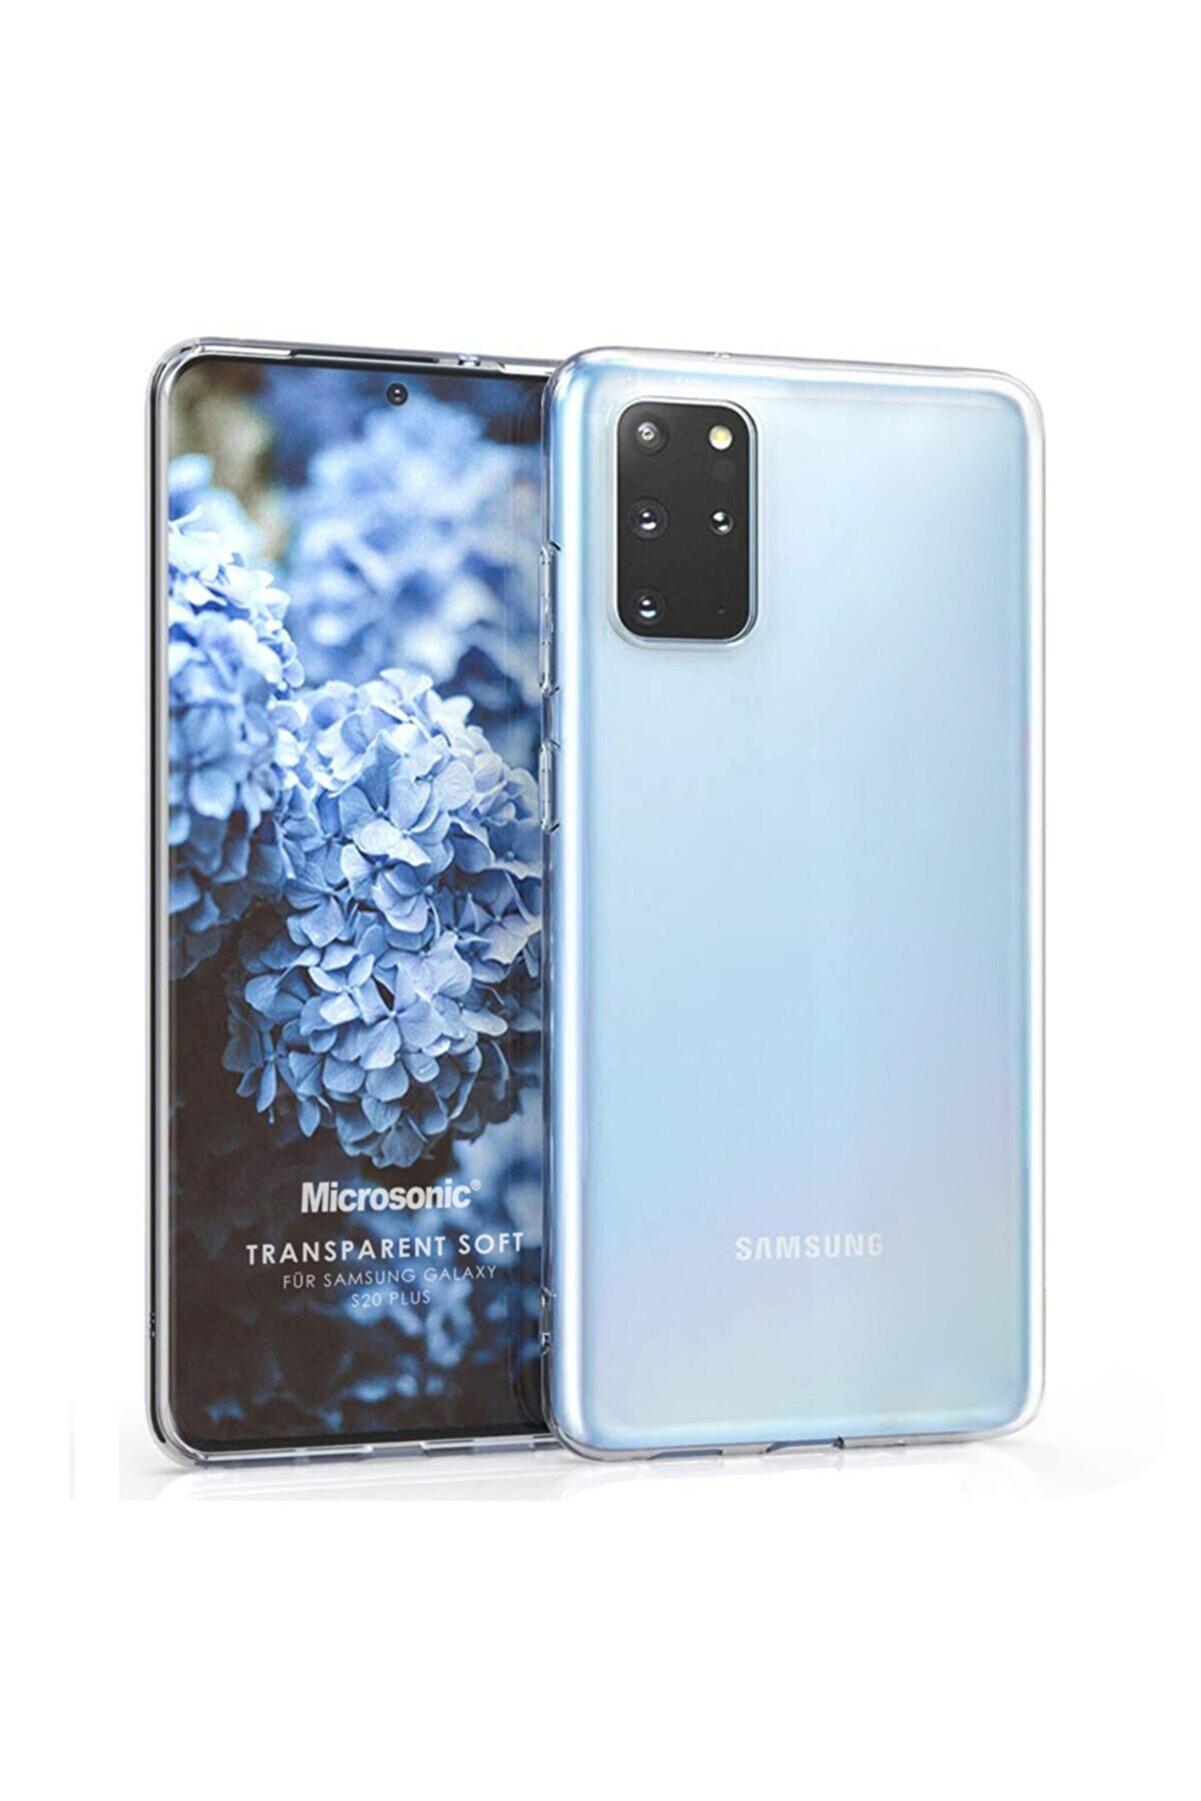 Microsonic Microsonic Galaxy S20 Plus Kılıf Transparent Soft Beyaz